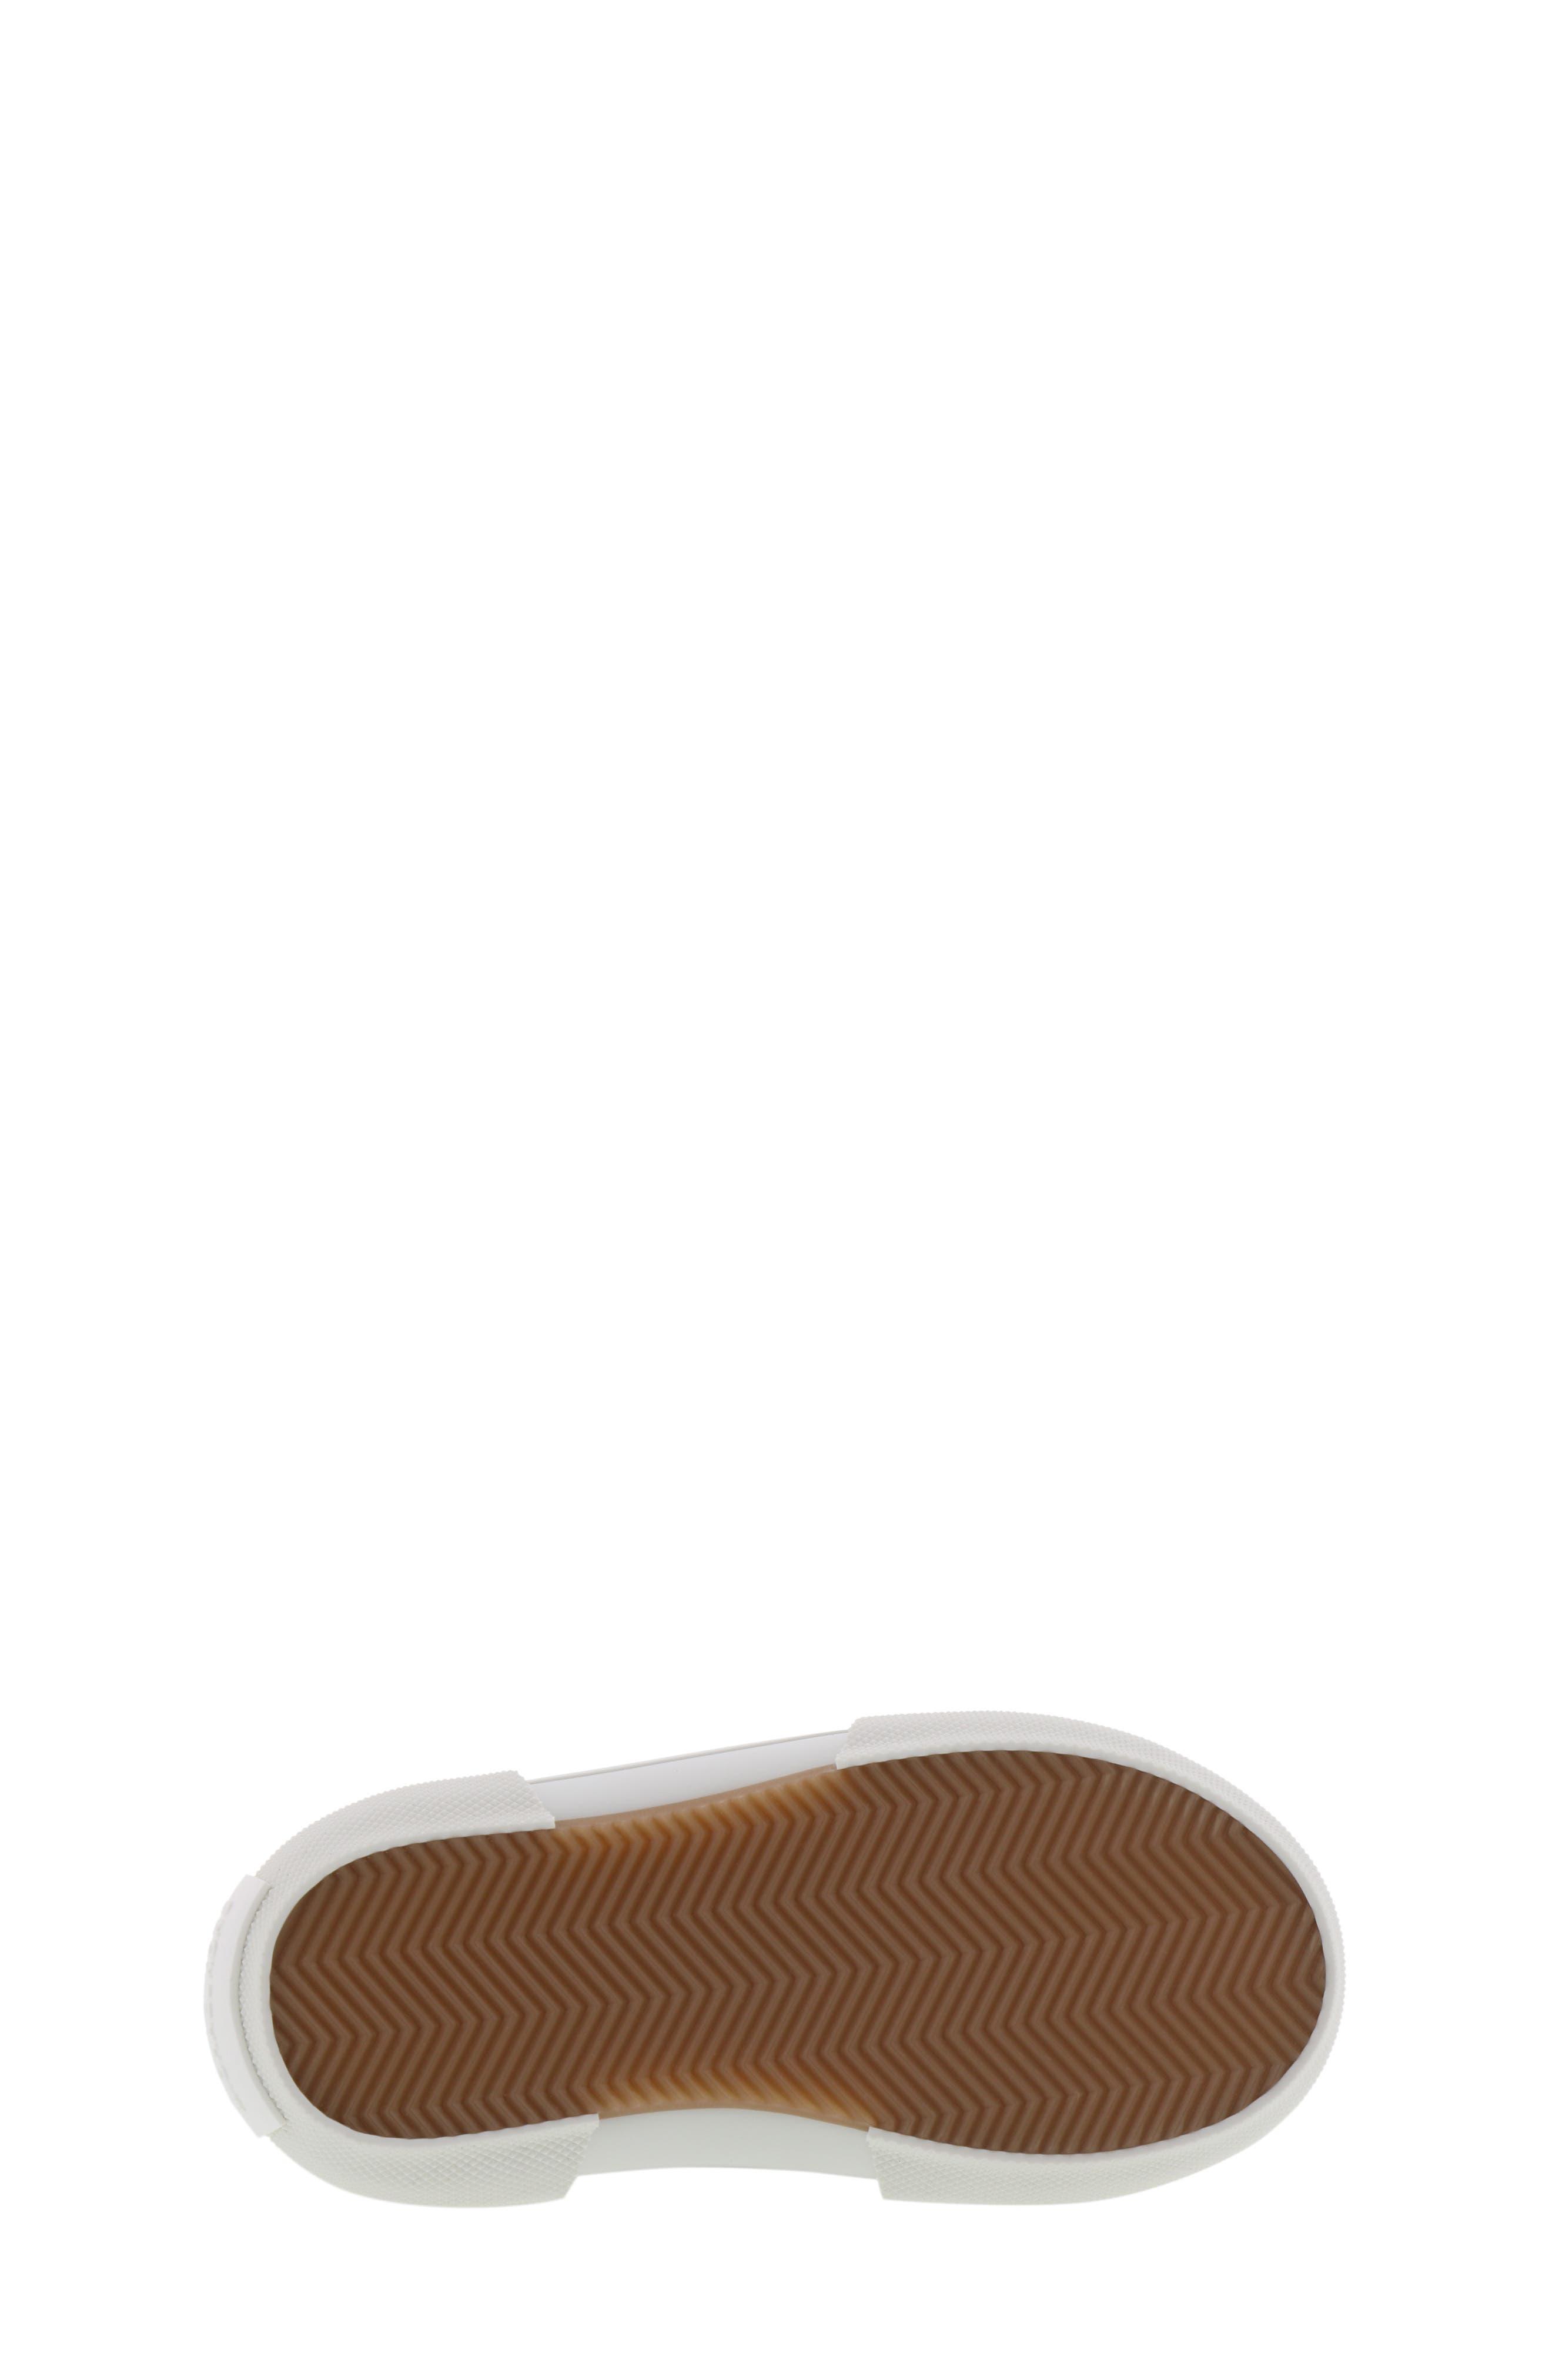 Ima Double Platform Sneaker,                             Alternate thumbnail 6, color,                             VANILLA/ BLUSH